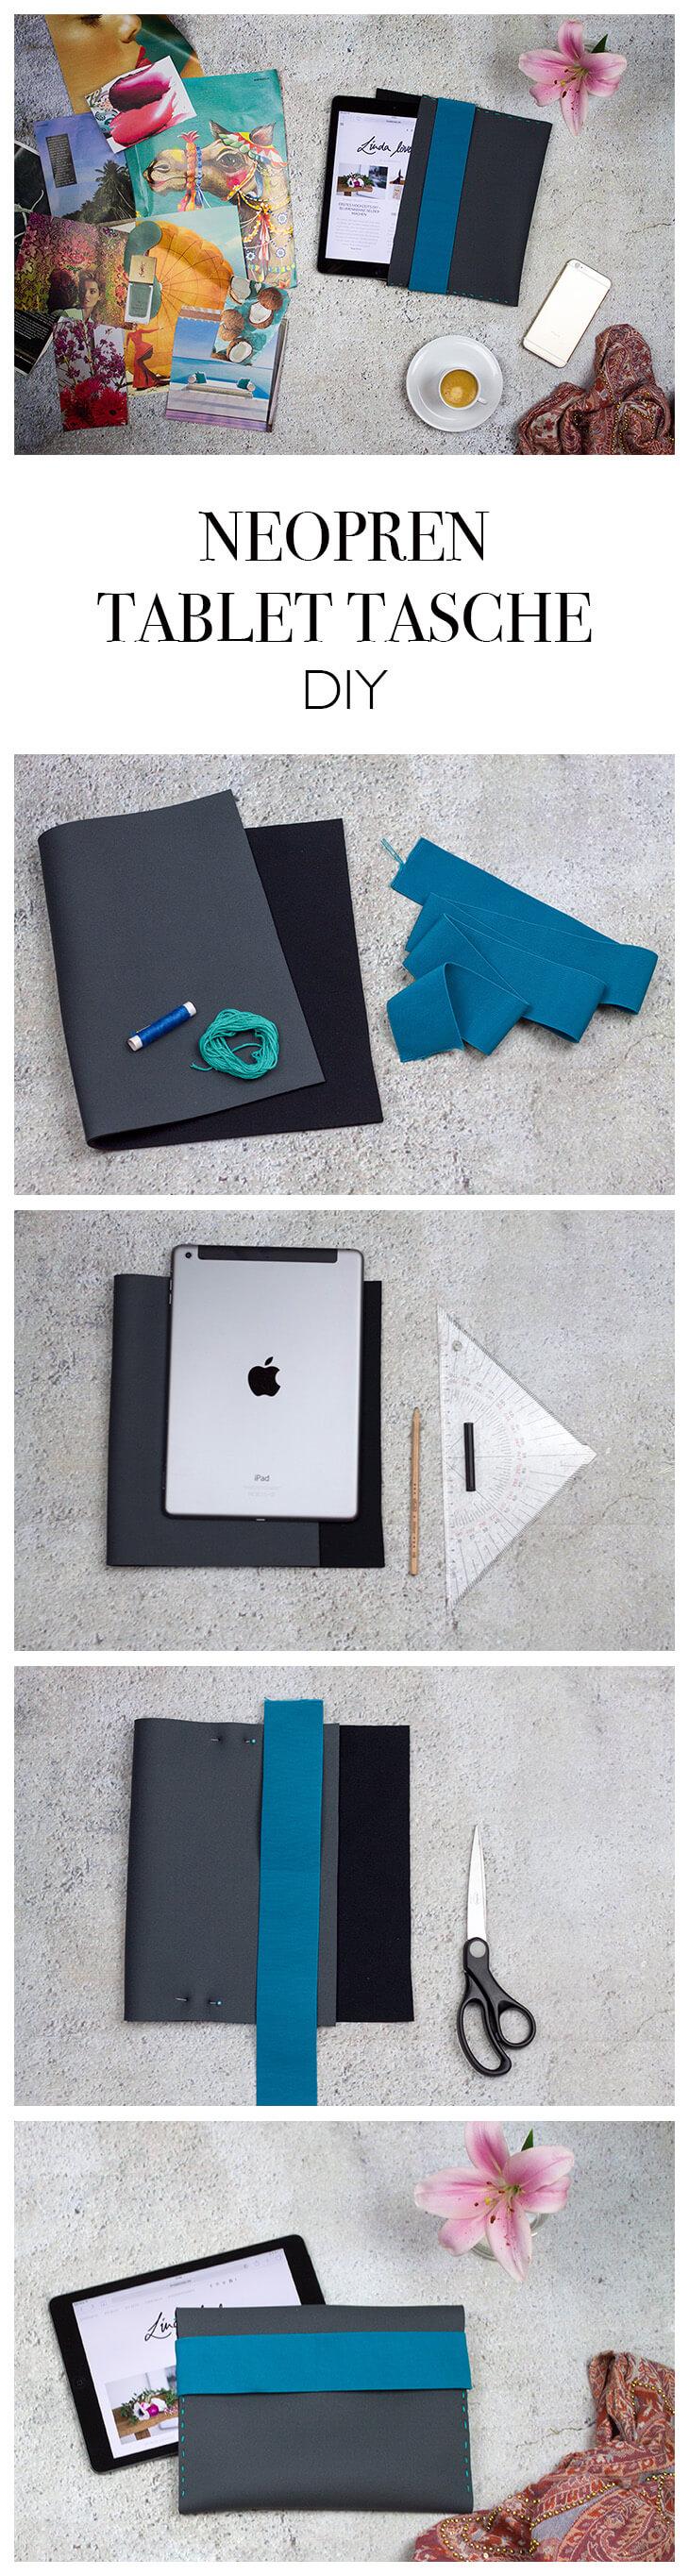 Neopren Tablet Tasche nähen mit Gummiband - Step-by-Step Anleitung - DIY Blog lindaloves.de